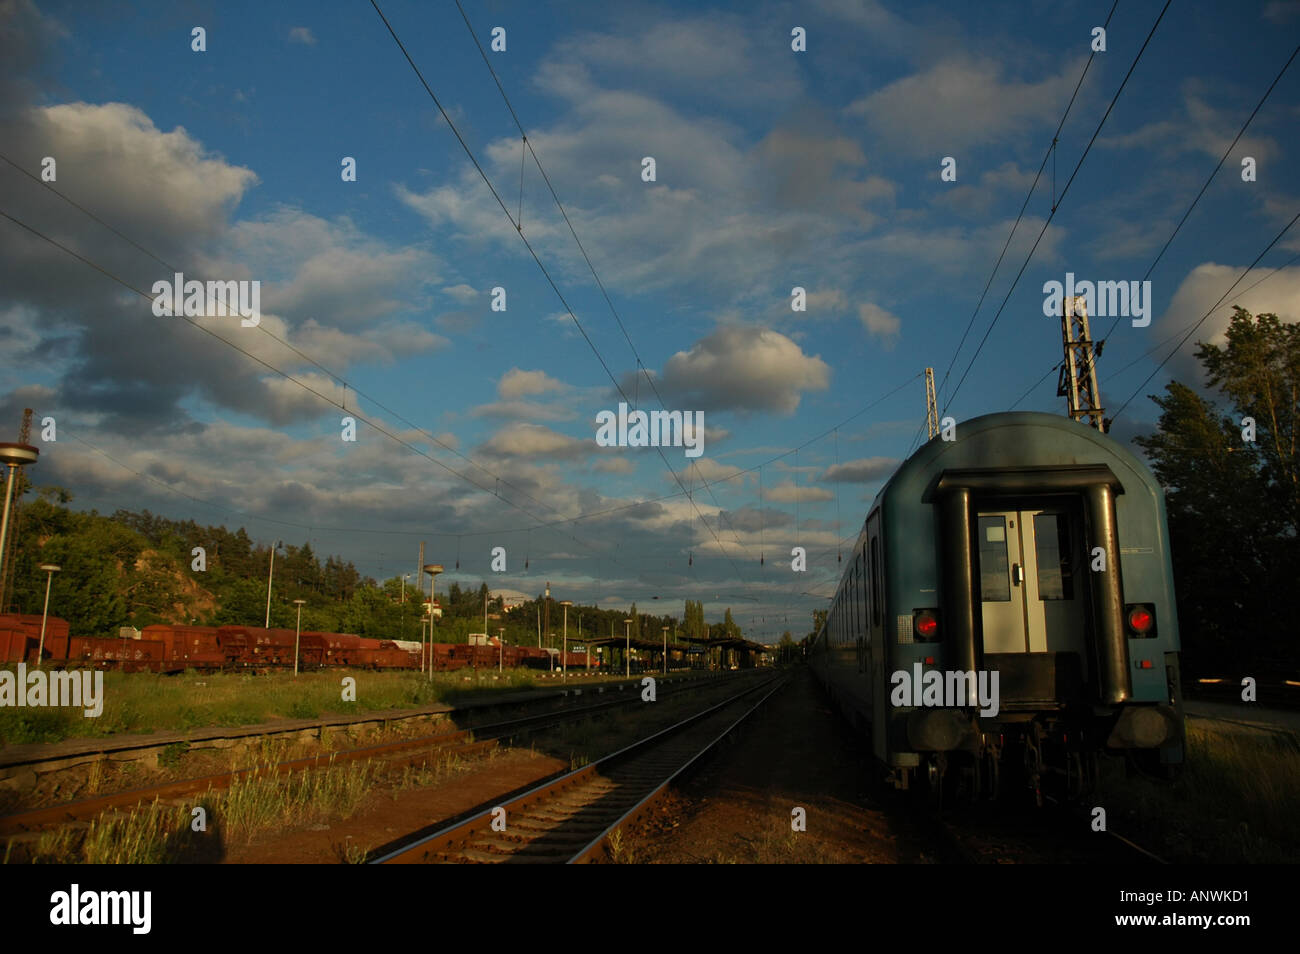 Eurocity Train Stock Photos & Eurocity Train Stock Images - Alamy